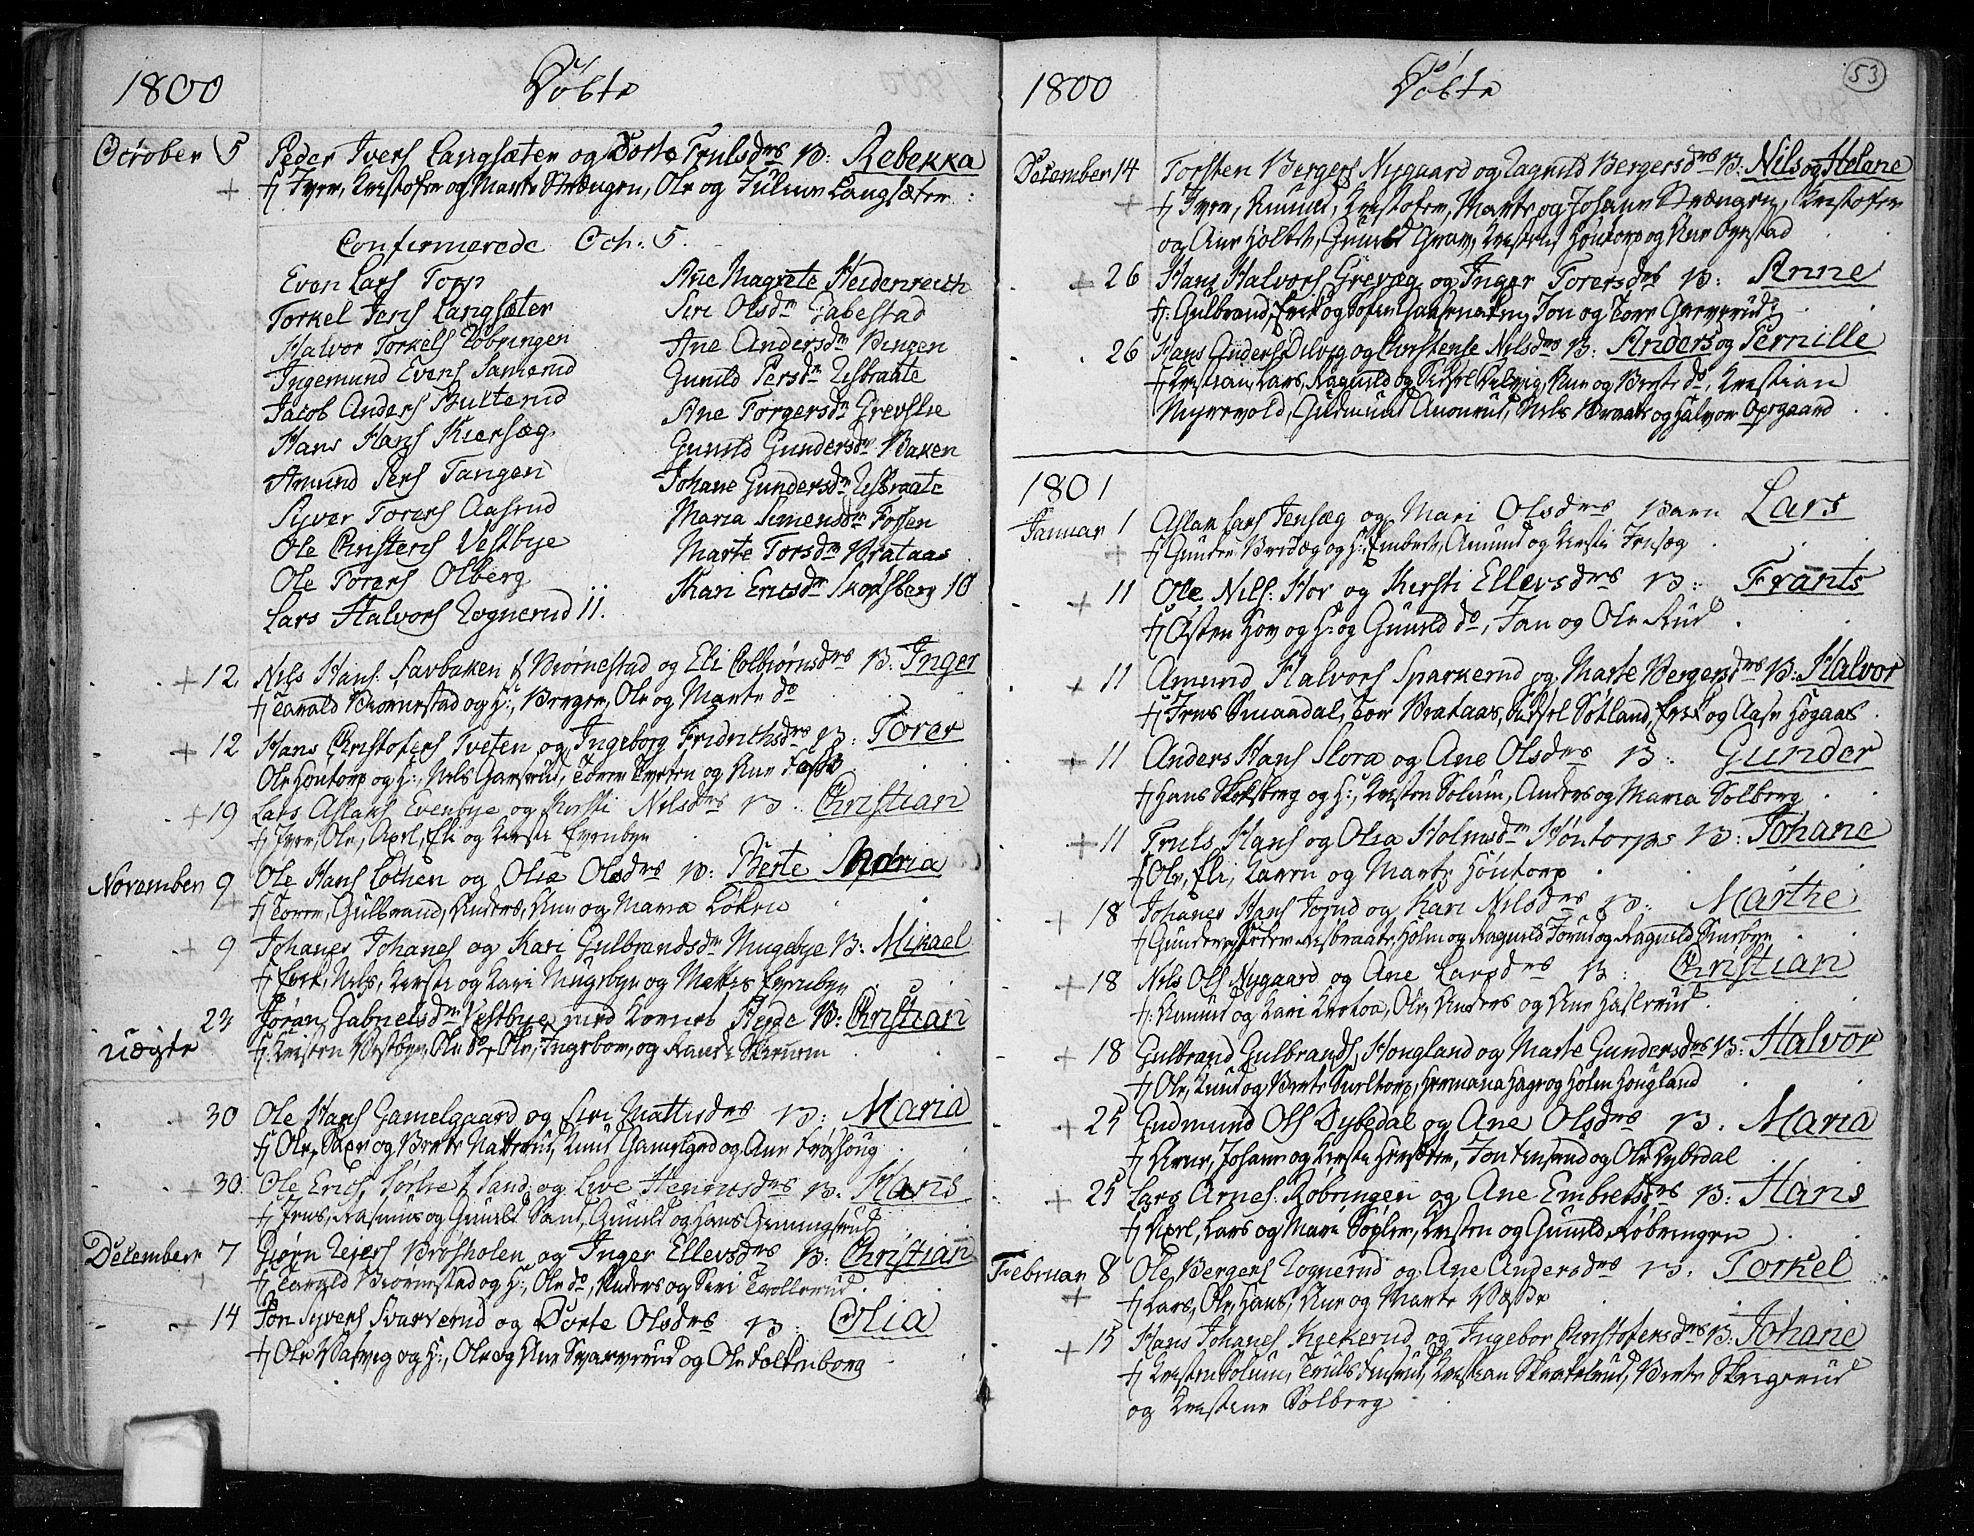 SAO, Trøgstad prestekontor Kirkebøker, F/Fa/L0005: Ministerialbok nr. I 5, 1784-1814, s. 53